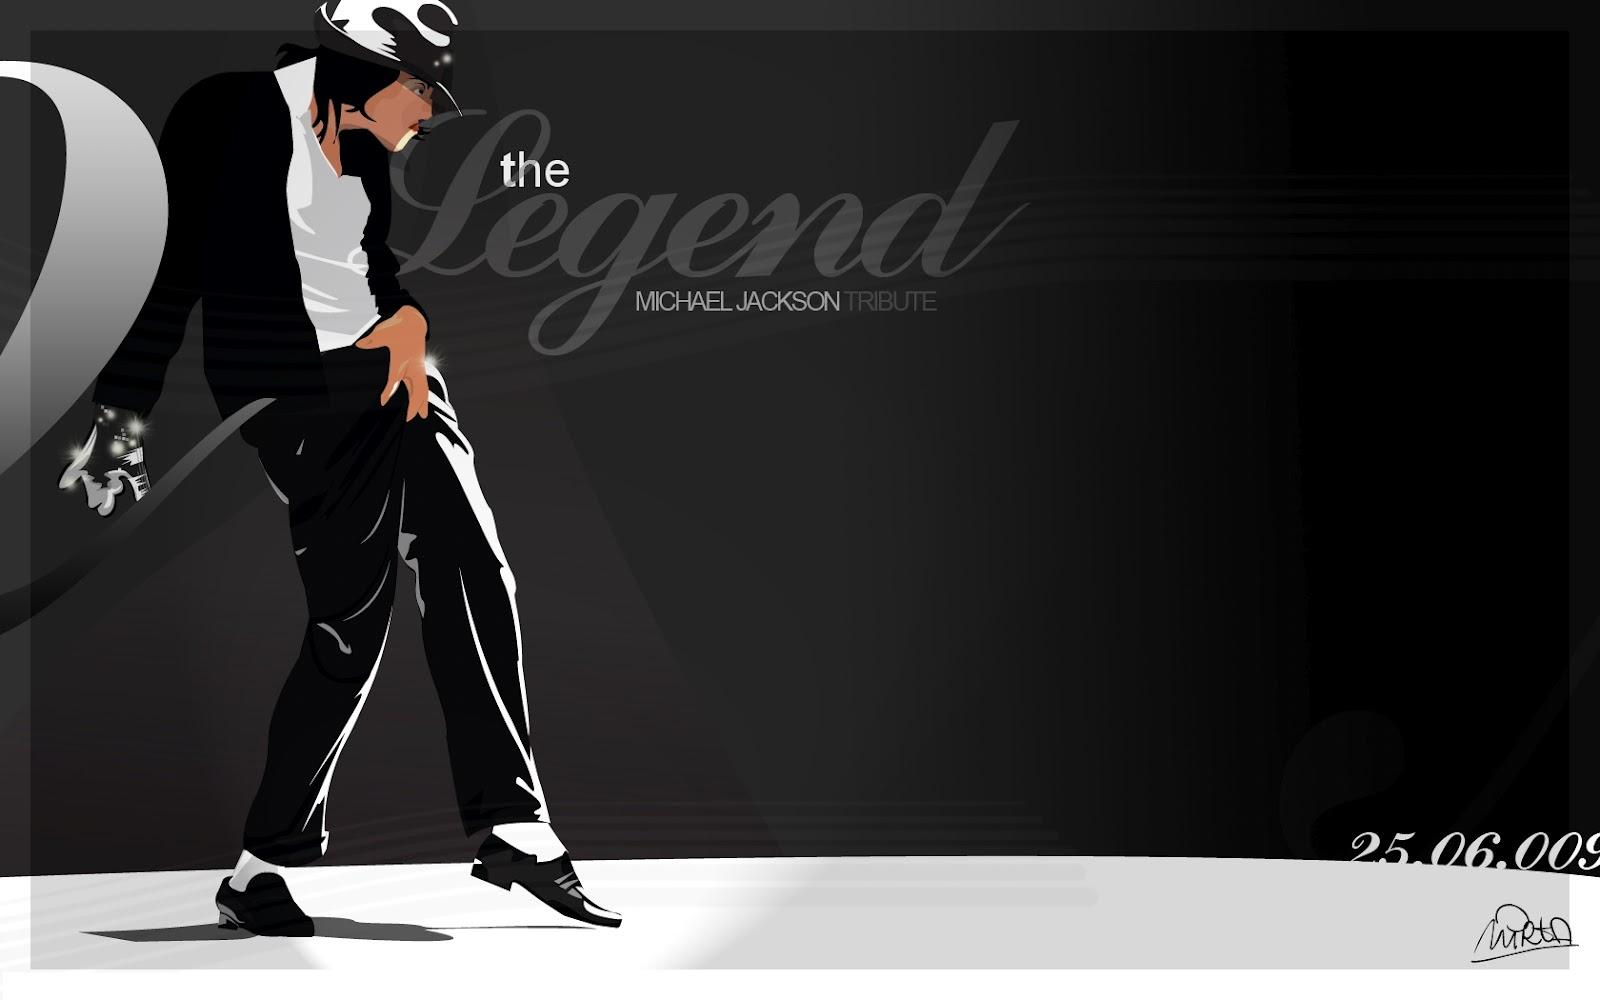 http://1.bp.blogspot.com/-Jut8x4DEIE4/T2xdTm9QS8I/AAAAAAAADzE/qLMyHjTcRoM/s1600/Michael-Jackson+%2823%29.jpg